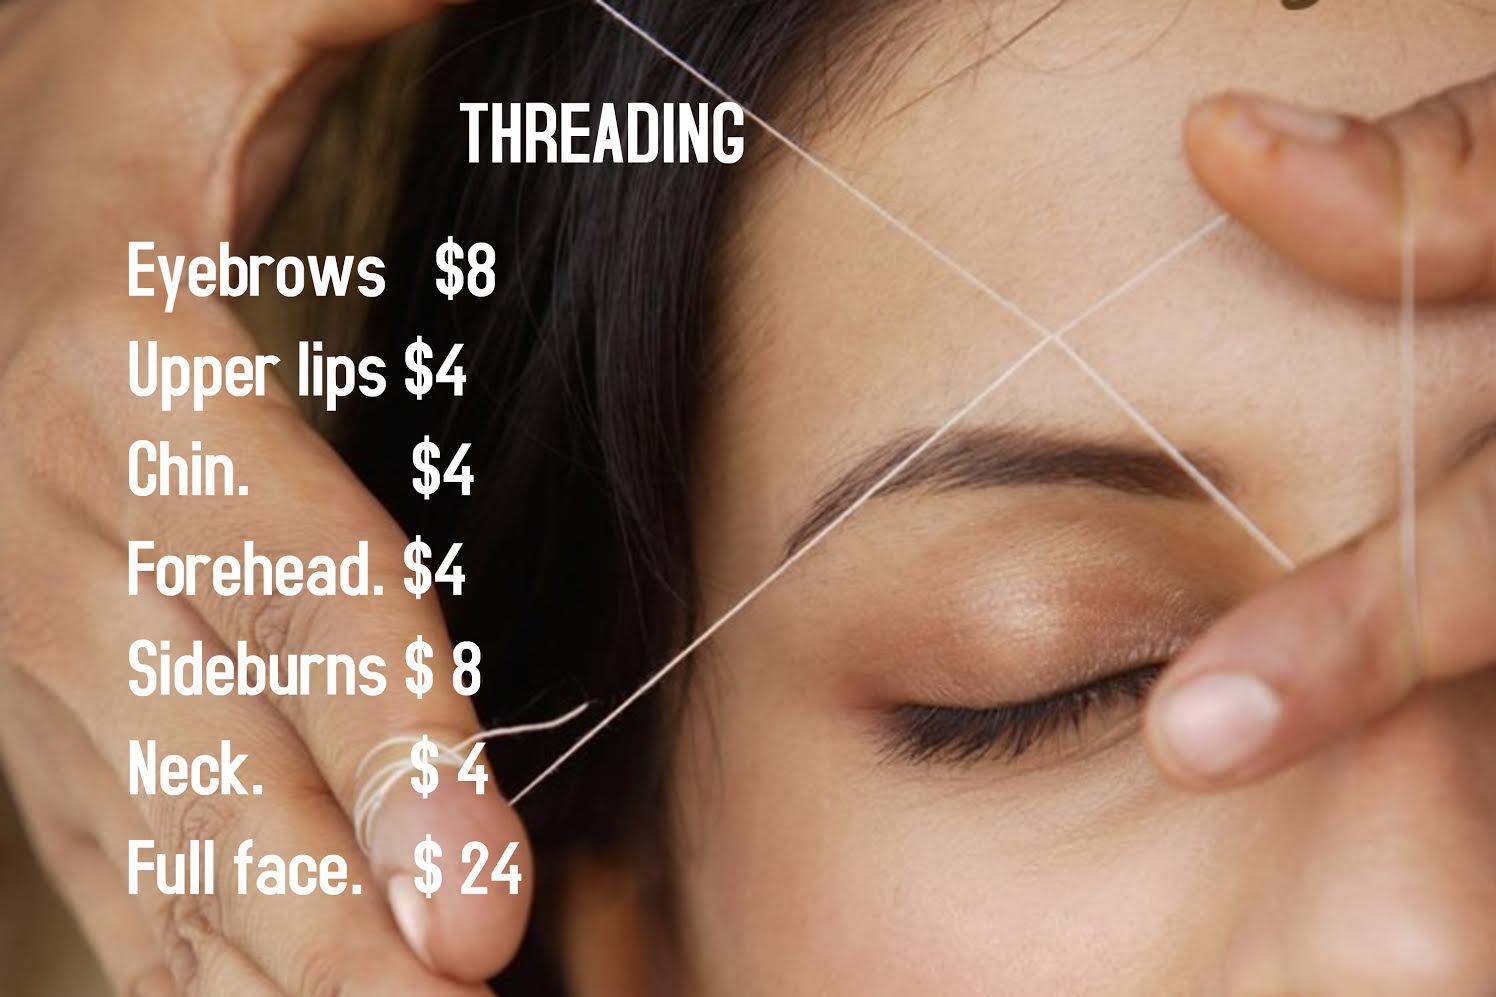 Eyebrow Threading In Dallas Tx 4698281793